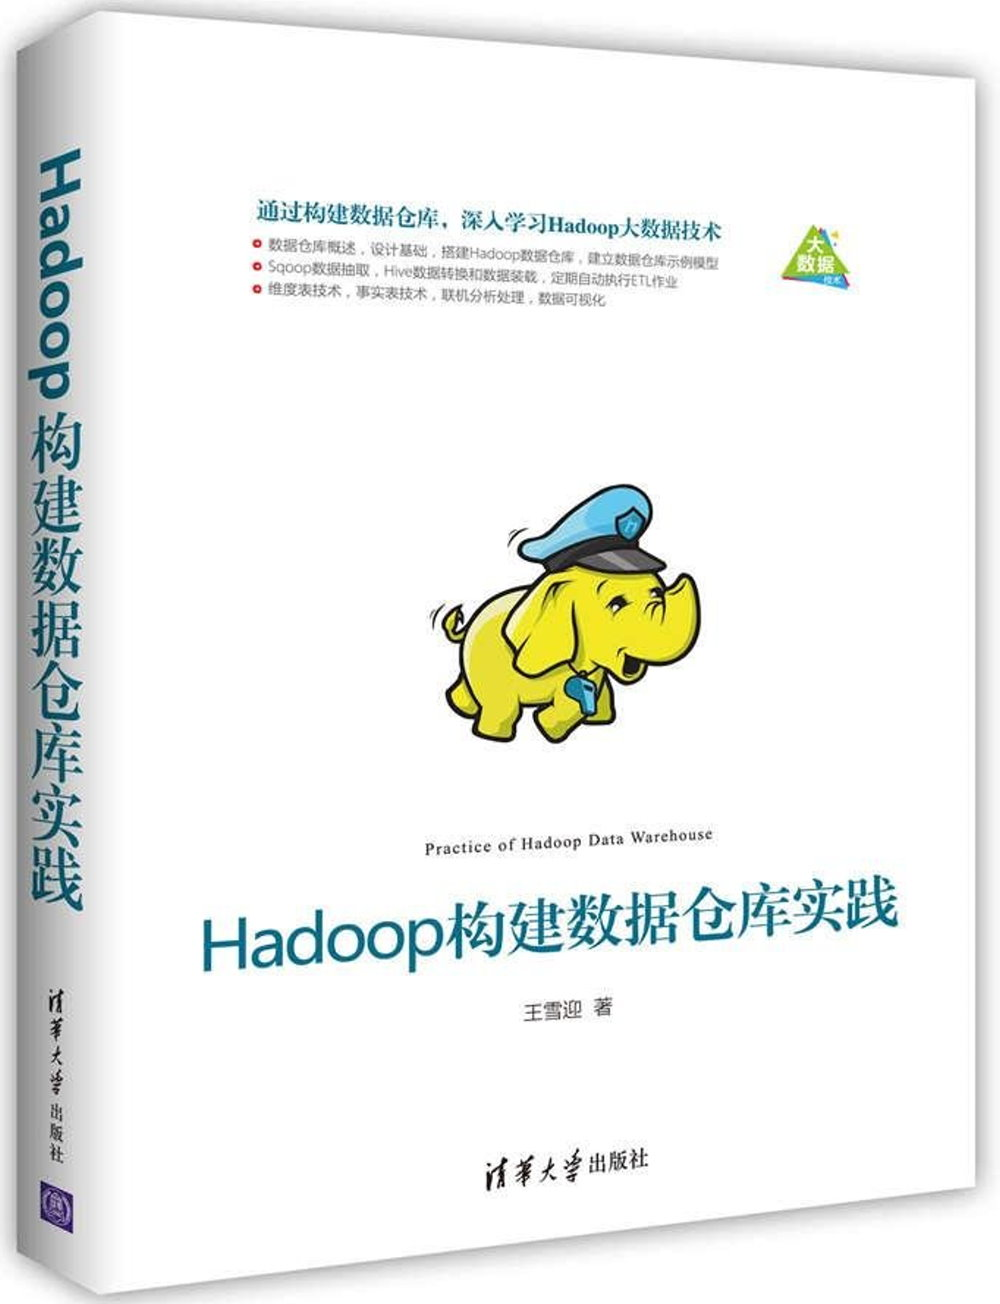 Hadoop構建數據倉庫實踐